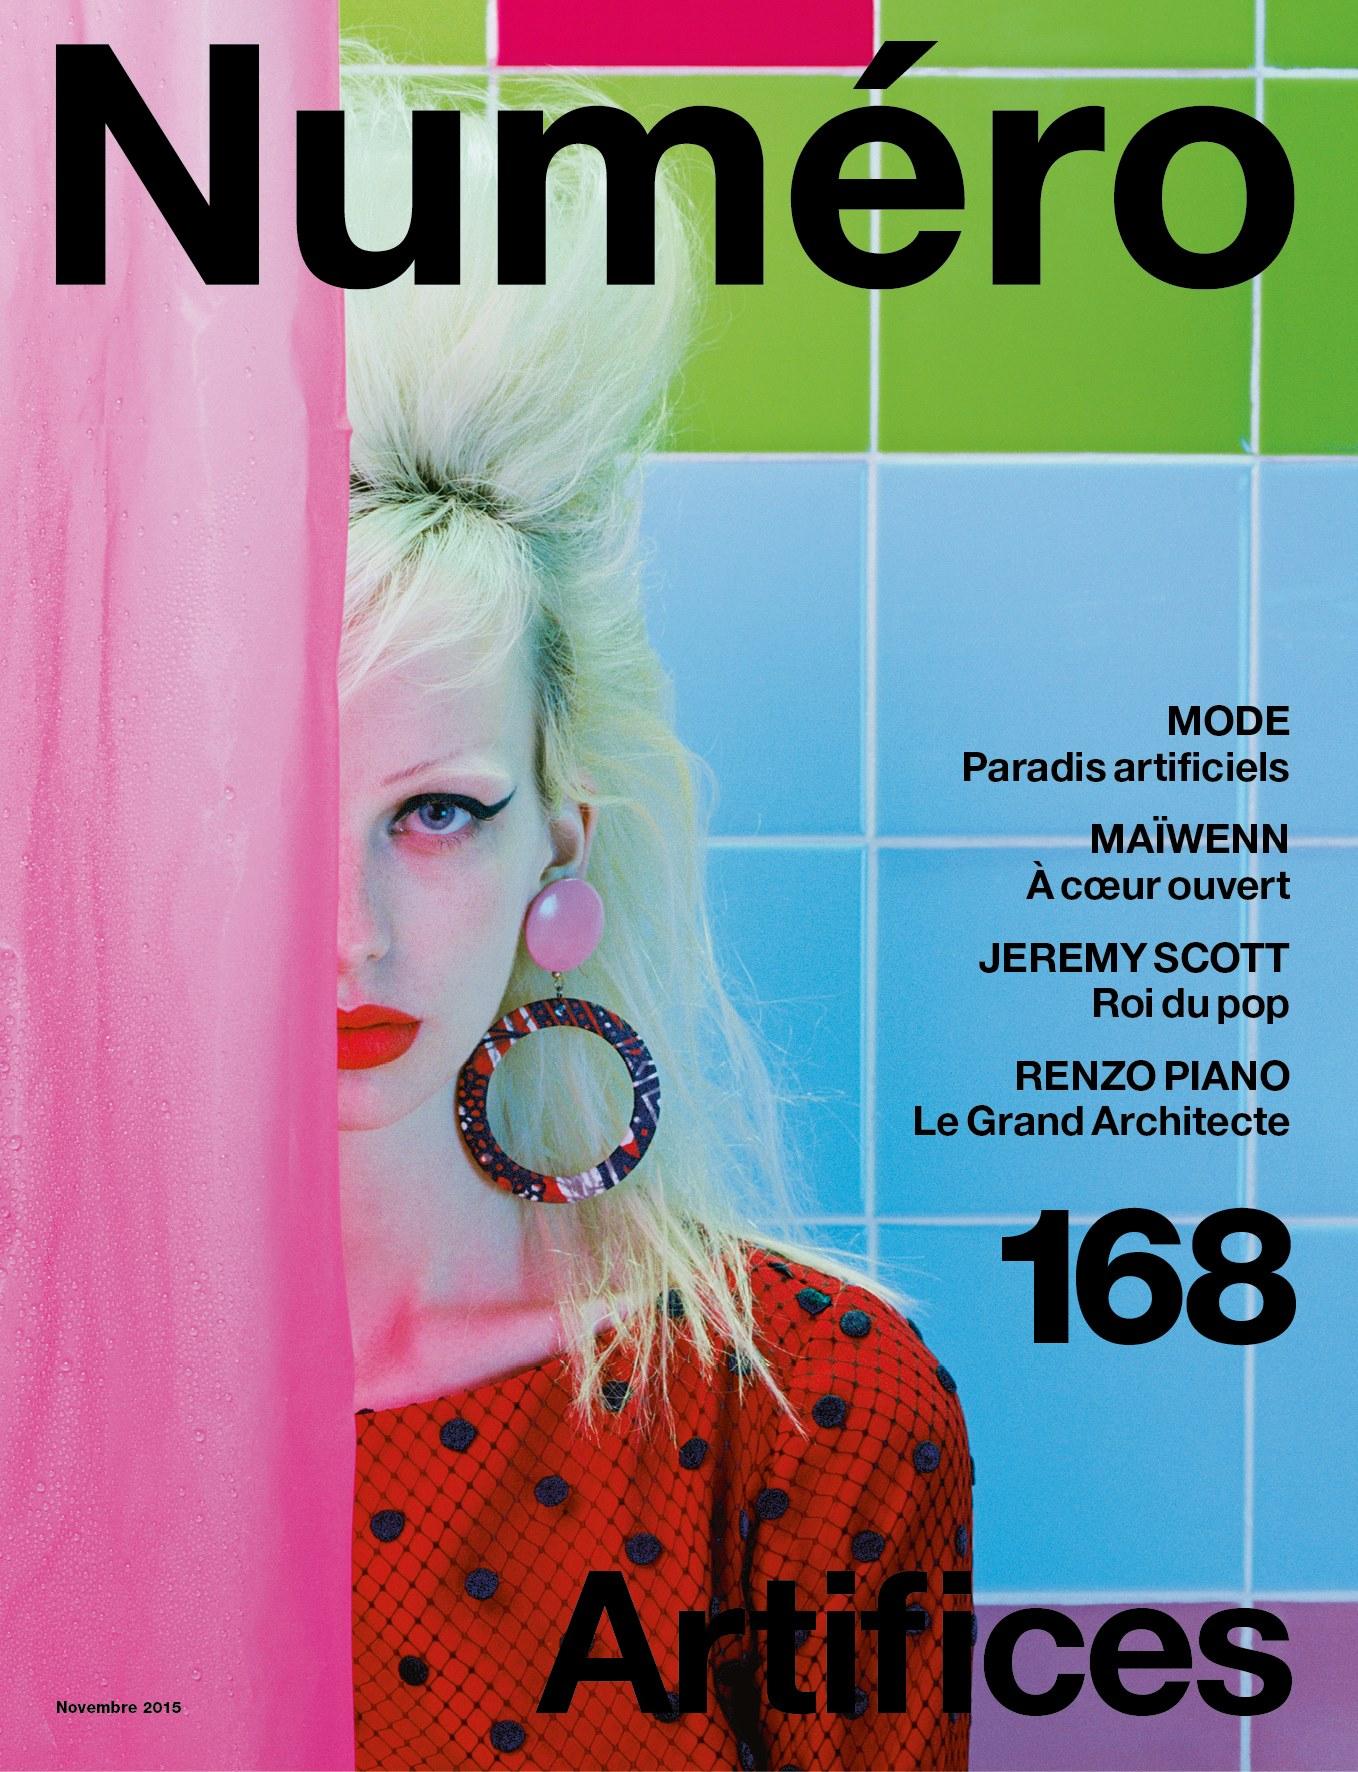 Las portadas de revistas de noviembre 2015